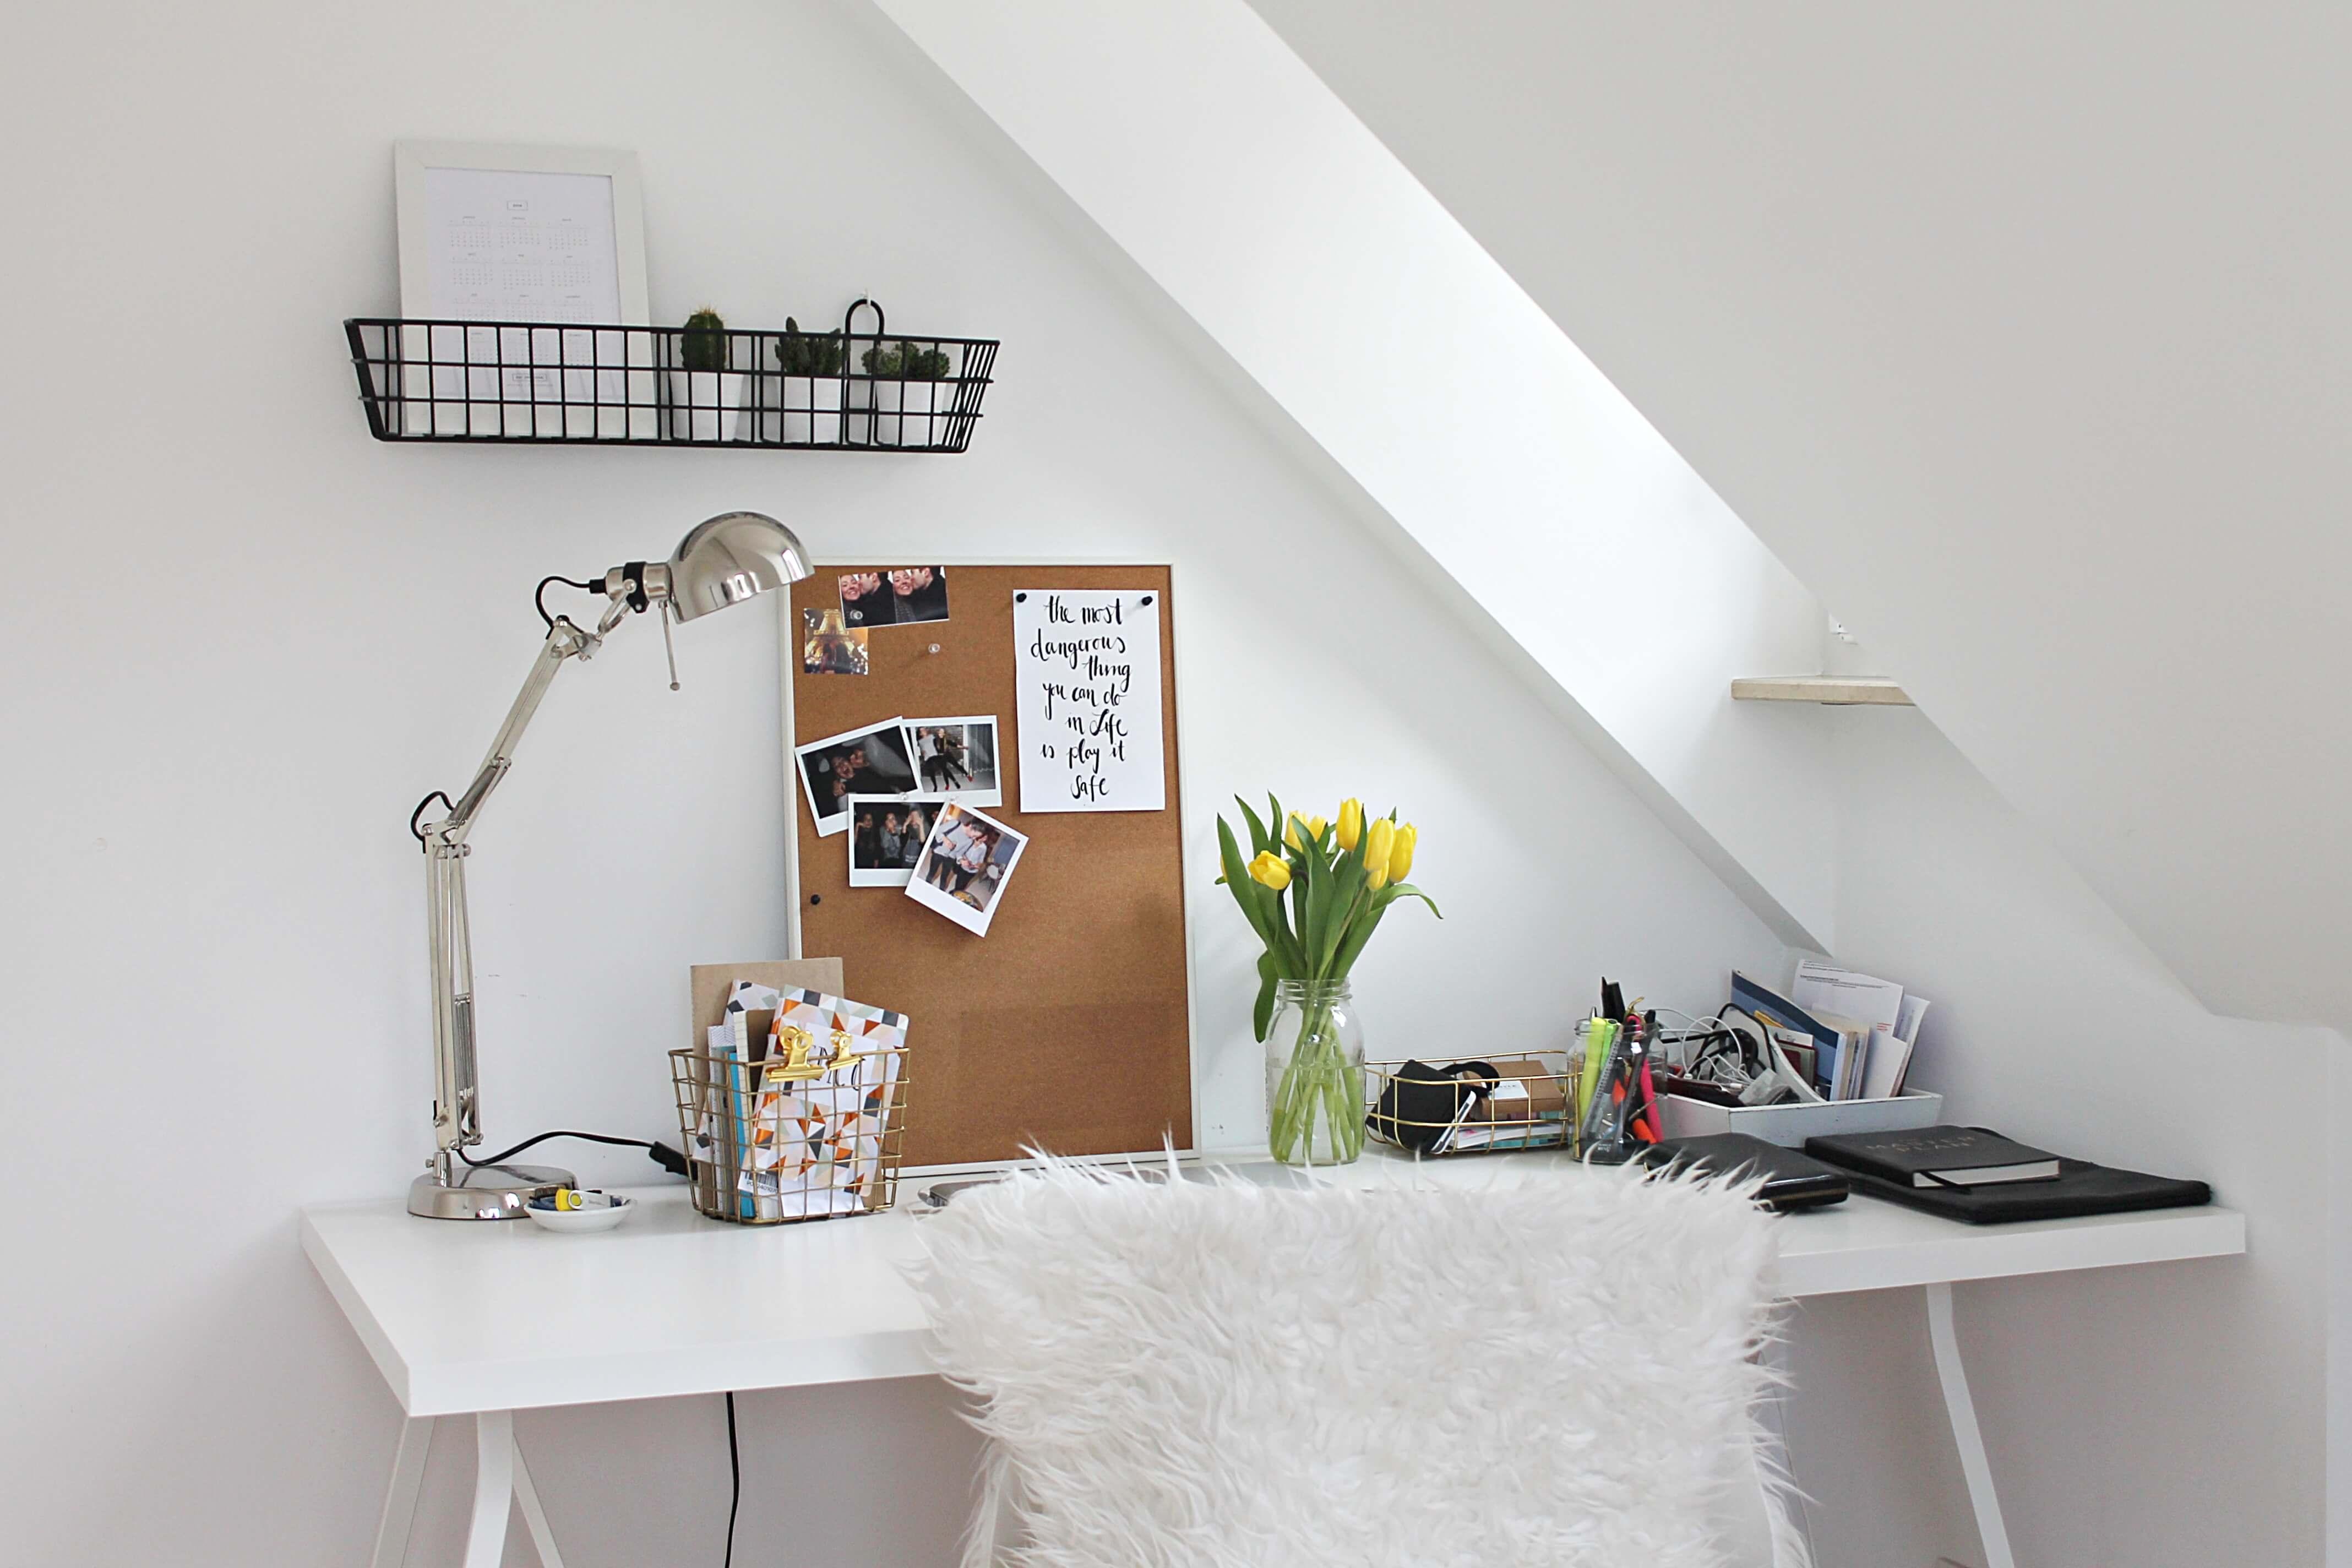 interior einrichung ikea wei do live. Black Bedroom Furniture Sets. Home Design Ideas